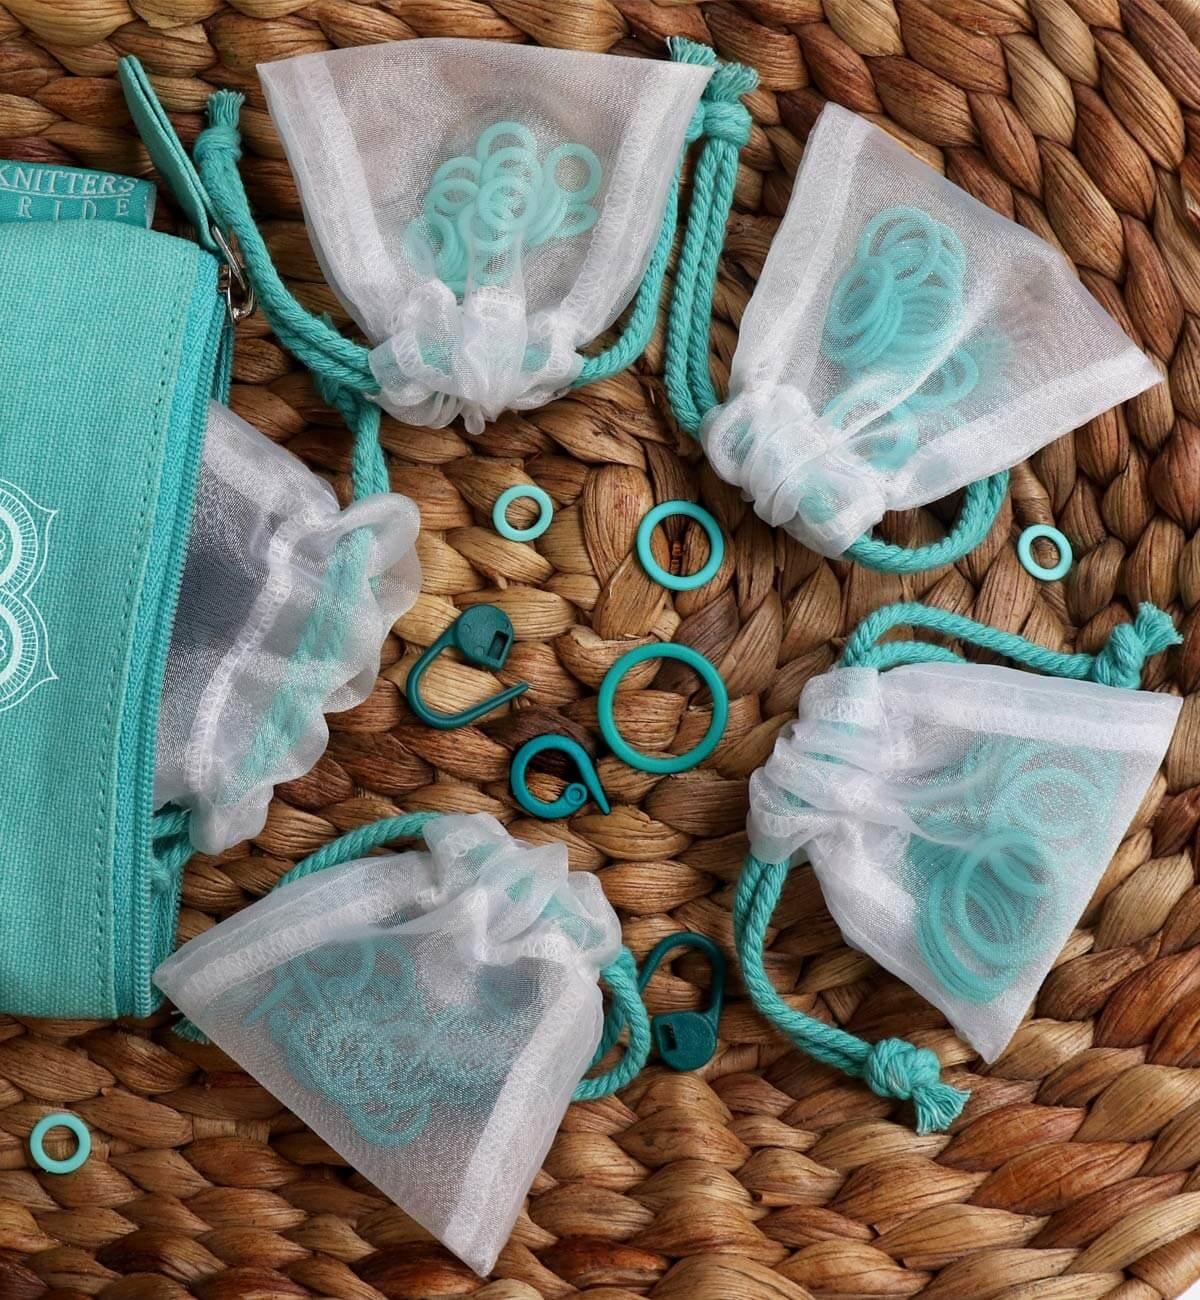 Knitters Pride KP Mindful 100pcs Stitch Marker Set